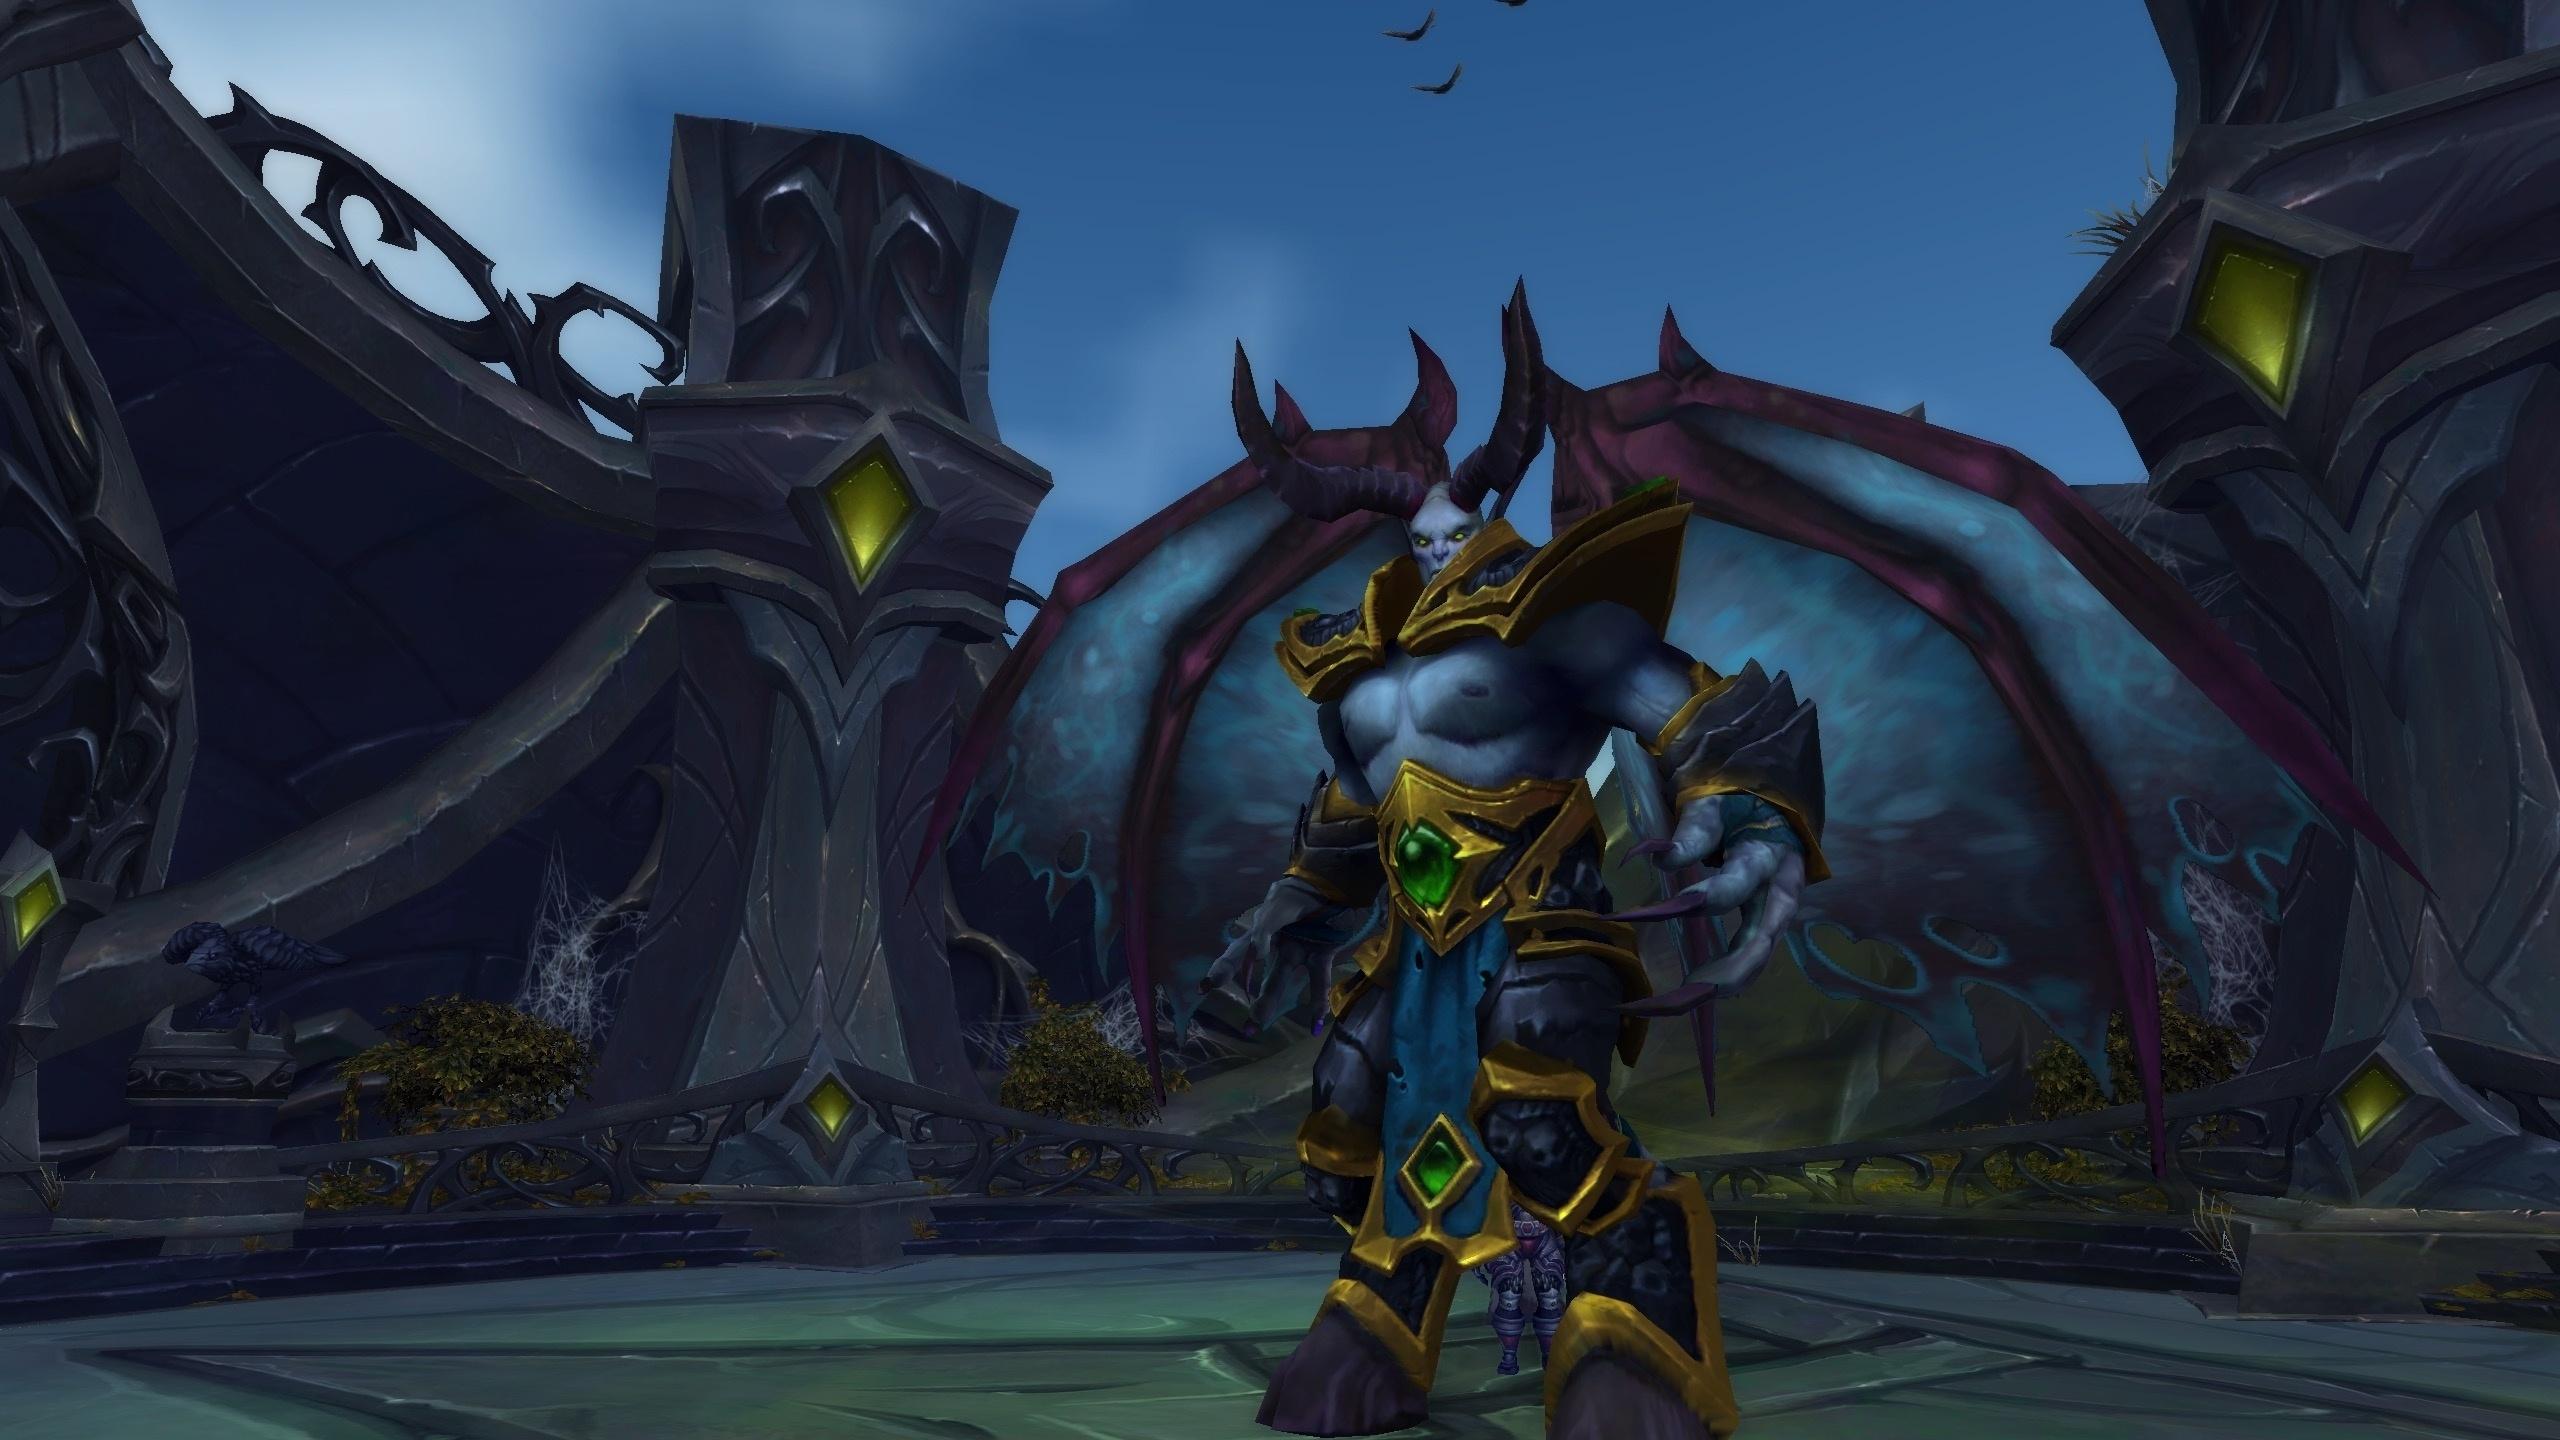 (black rock hold) world of warcraft: legion - слияние душ - иллисанна гребень ворона - хмуродроб лютый